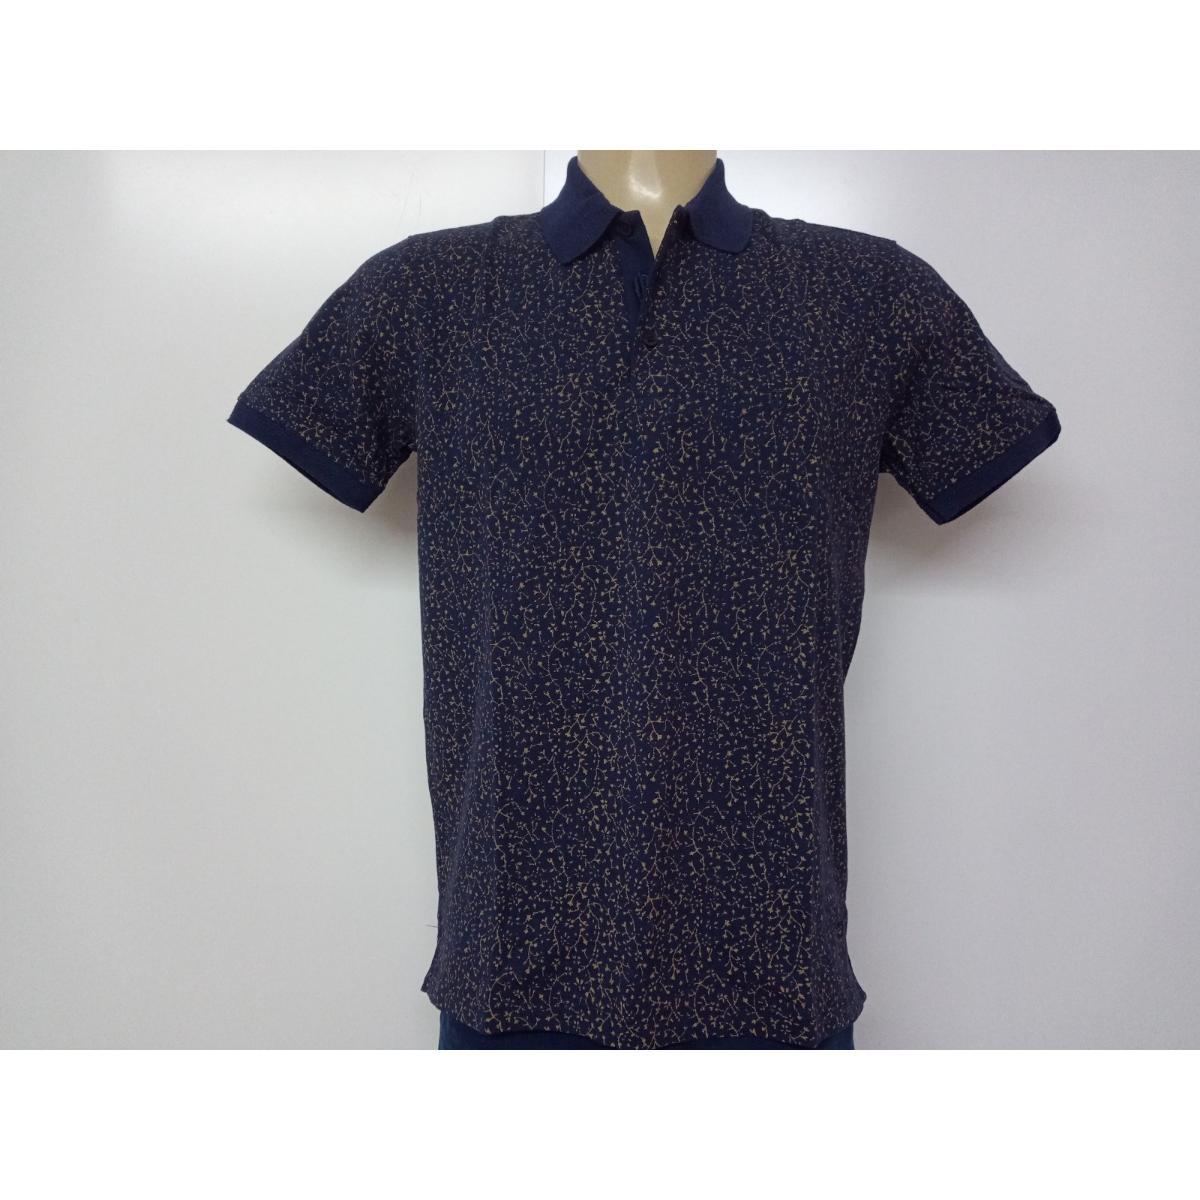 Camiseta Masculina Individual 08.75.0908.94 Marinho/floral